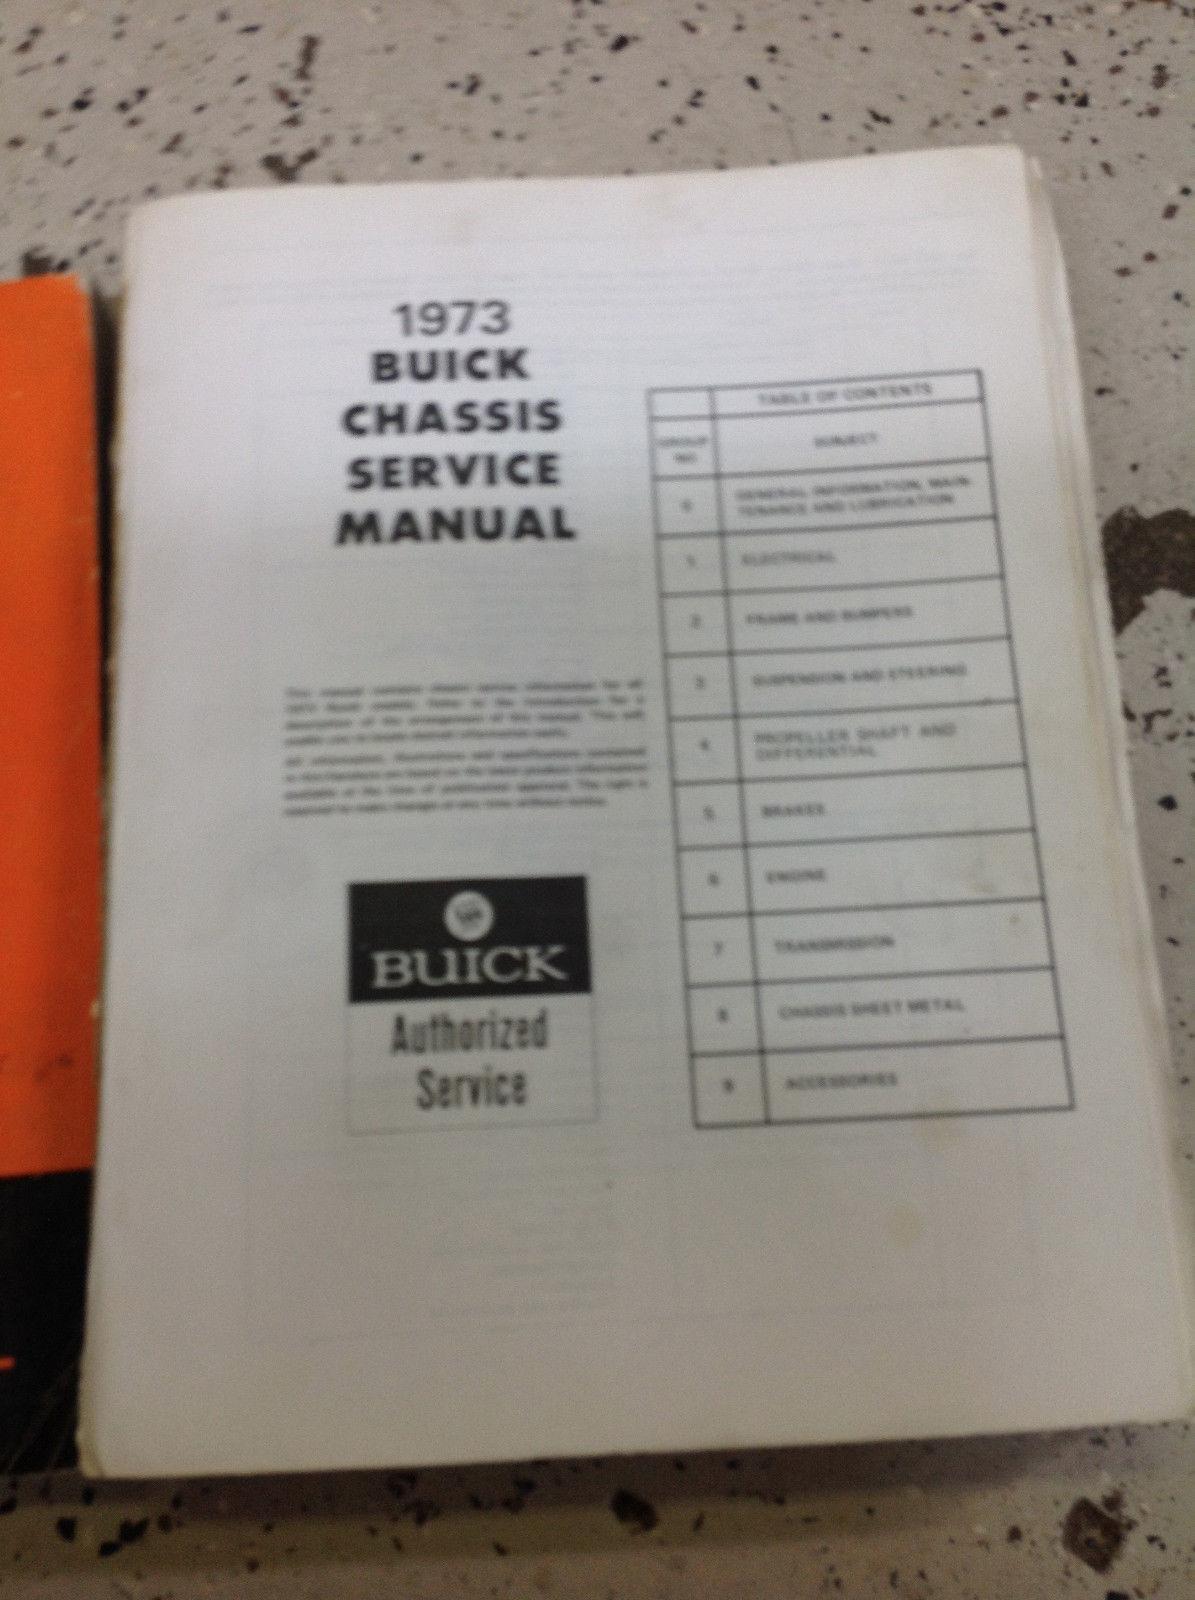 Werkstatthandbuch Buick Chassis Service Manual All Series 1978 Sachbücher Bücher